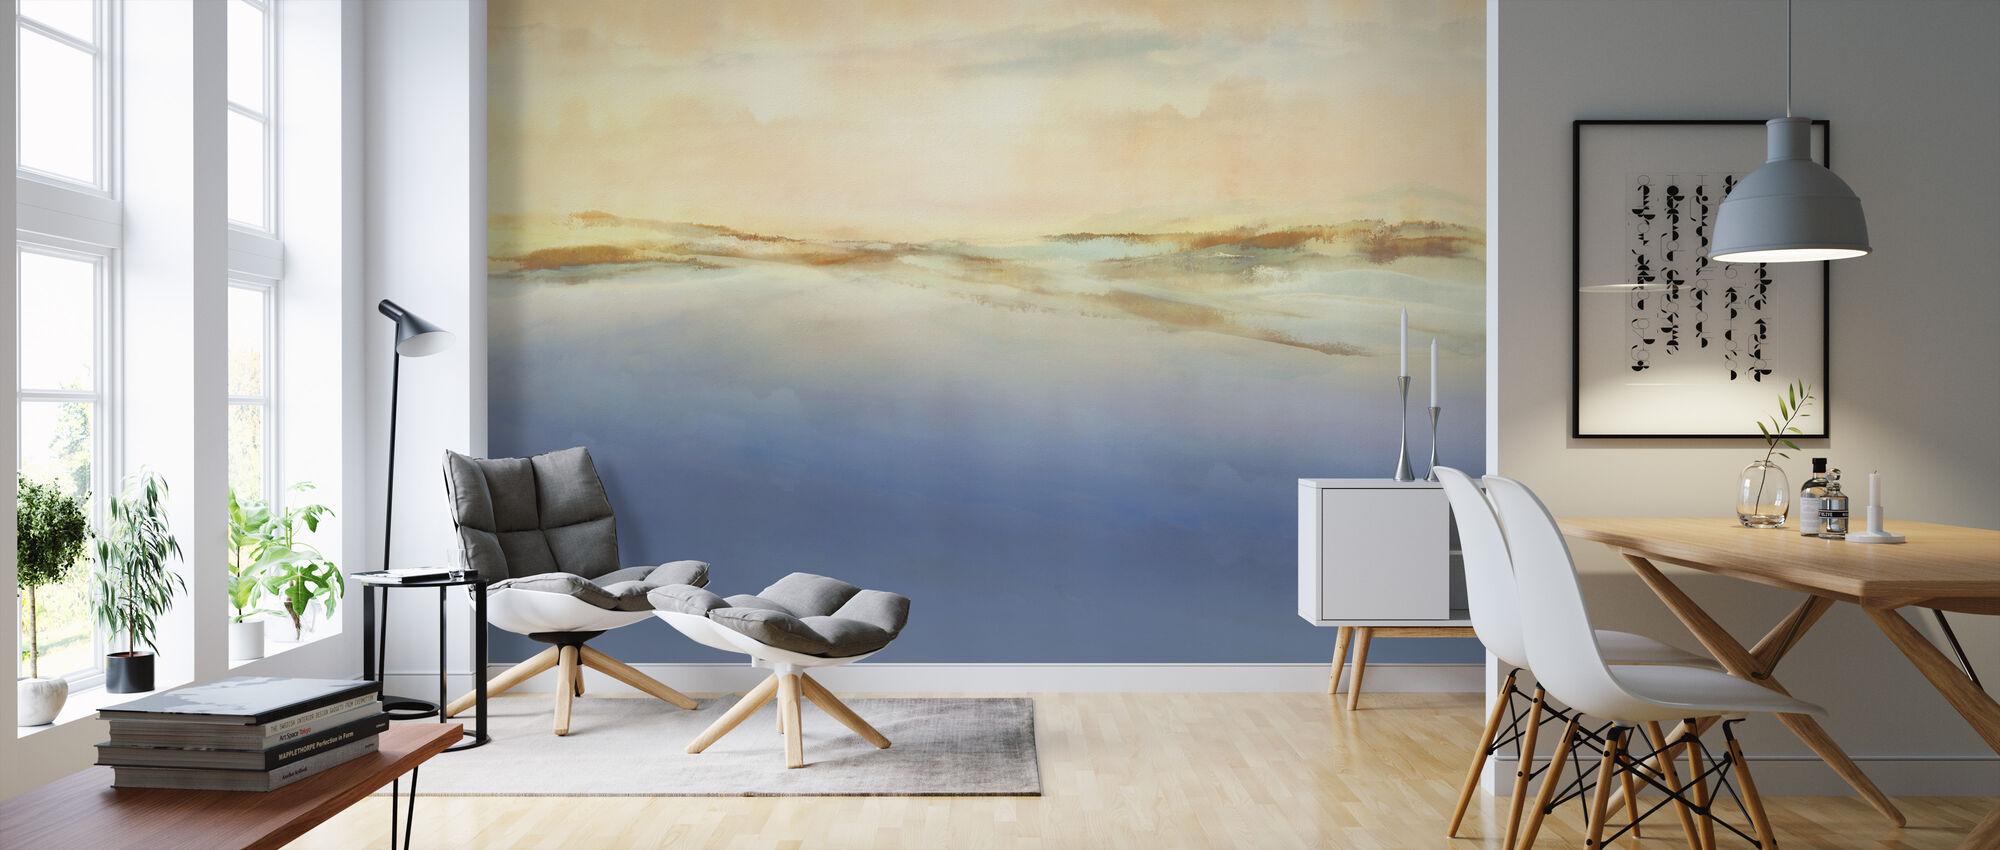 Dreamy Light IV - Wallpaper - Living Room